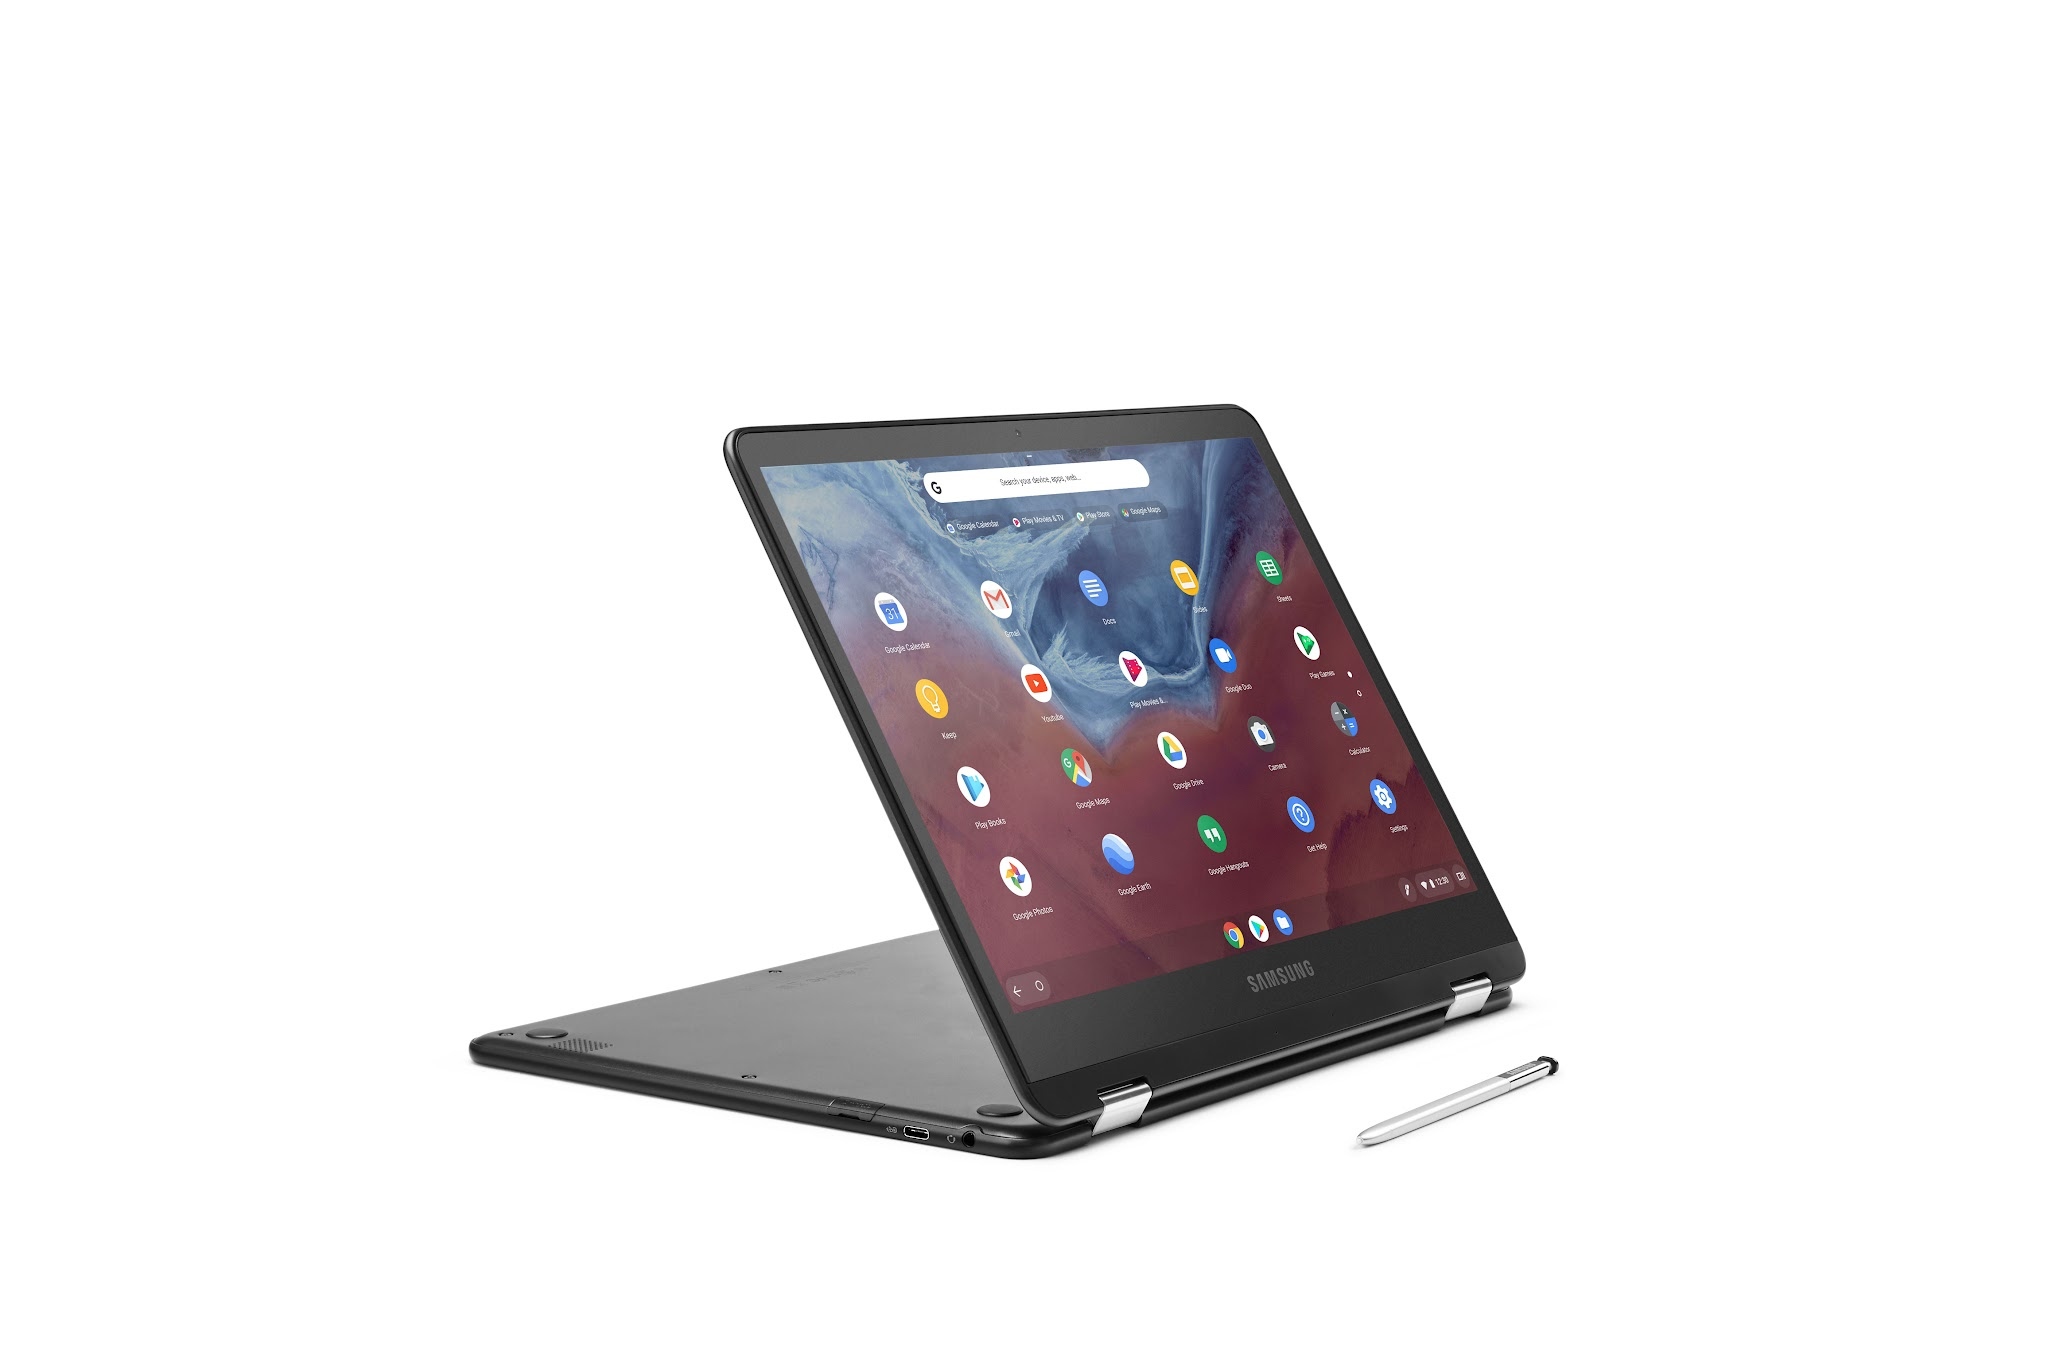 Samsung Chromebook Pro – Google Chromebooks